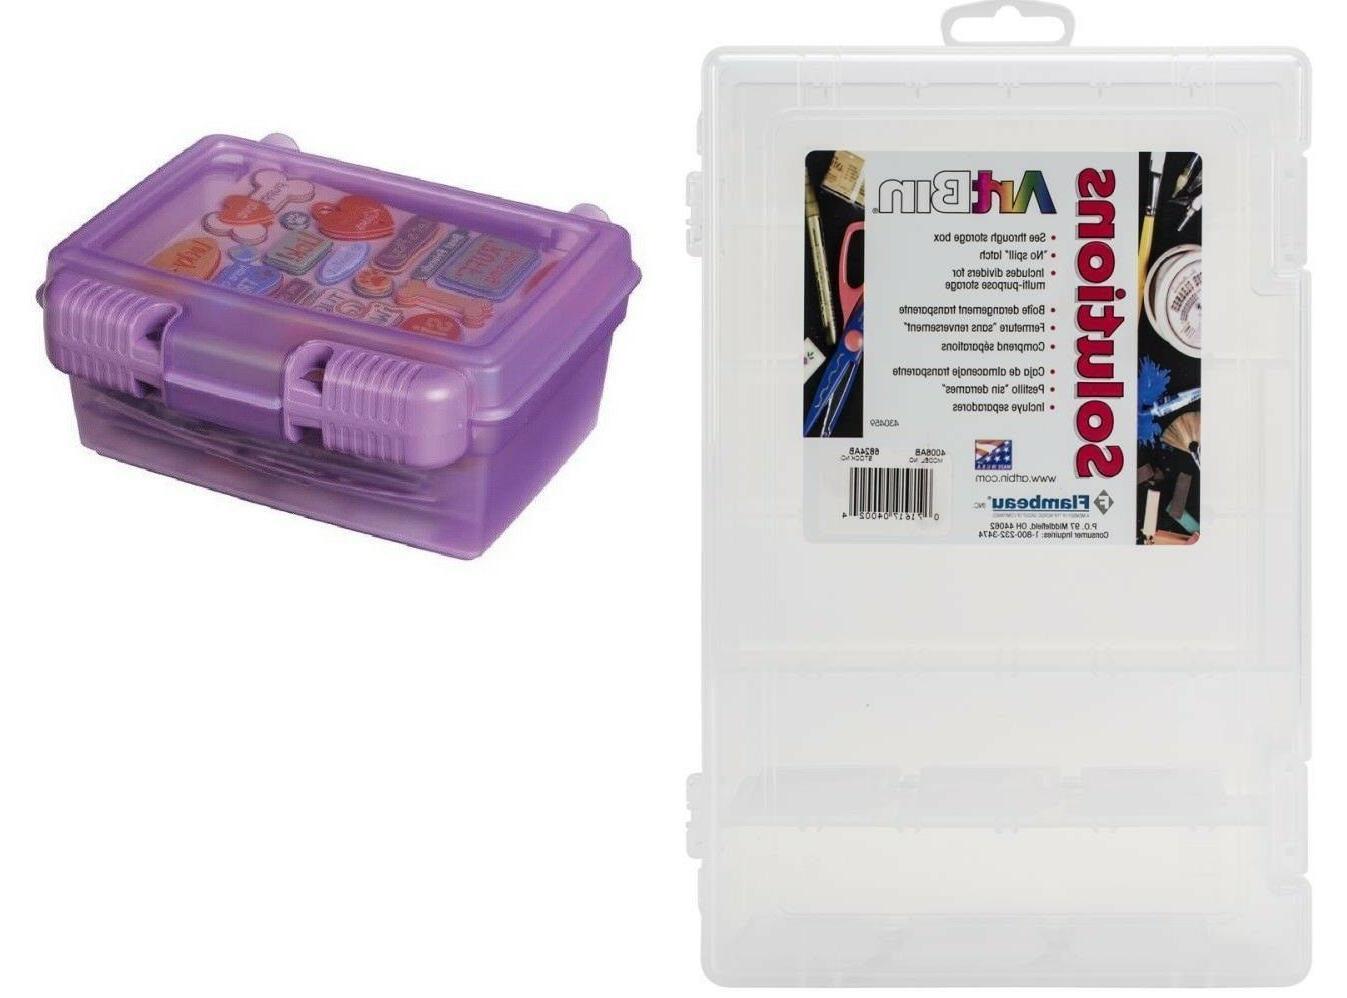 solutions box organizer for crafts school supplies